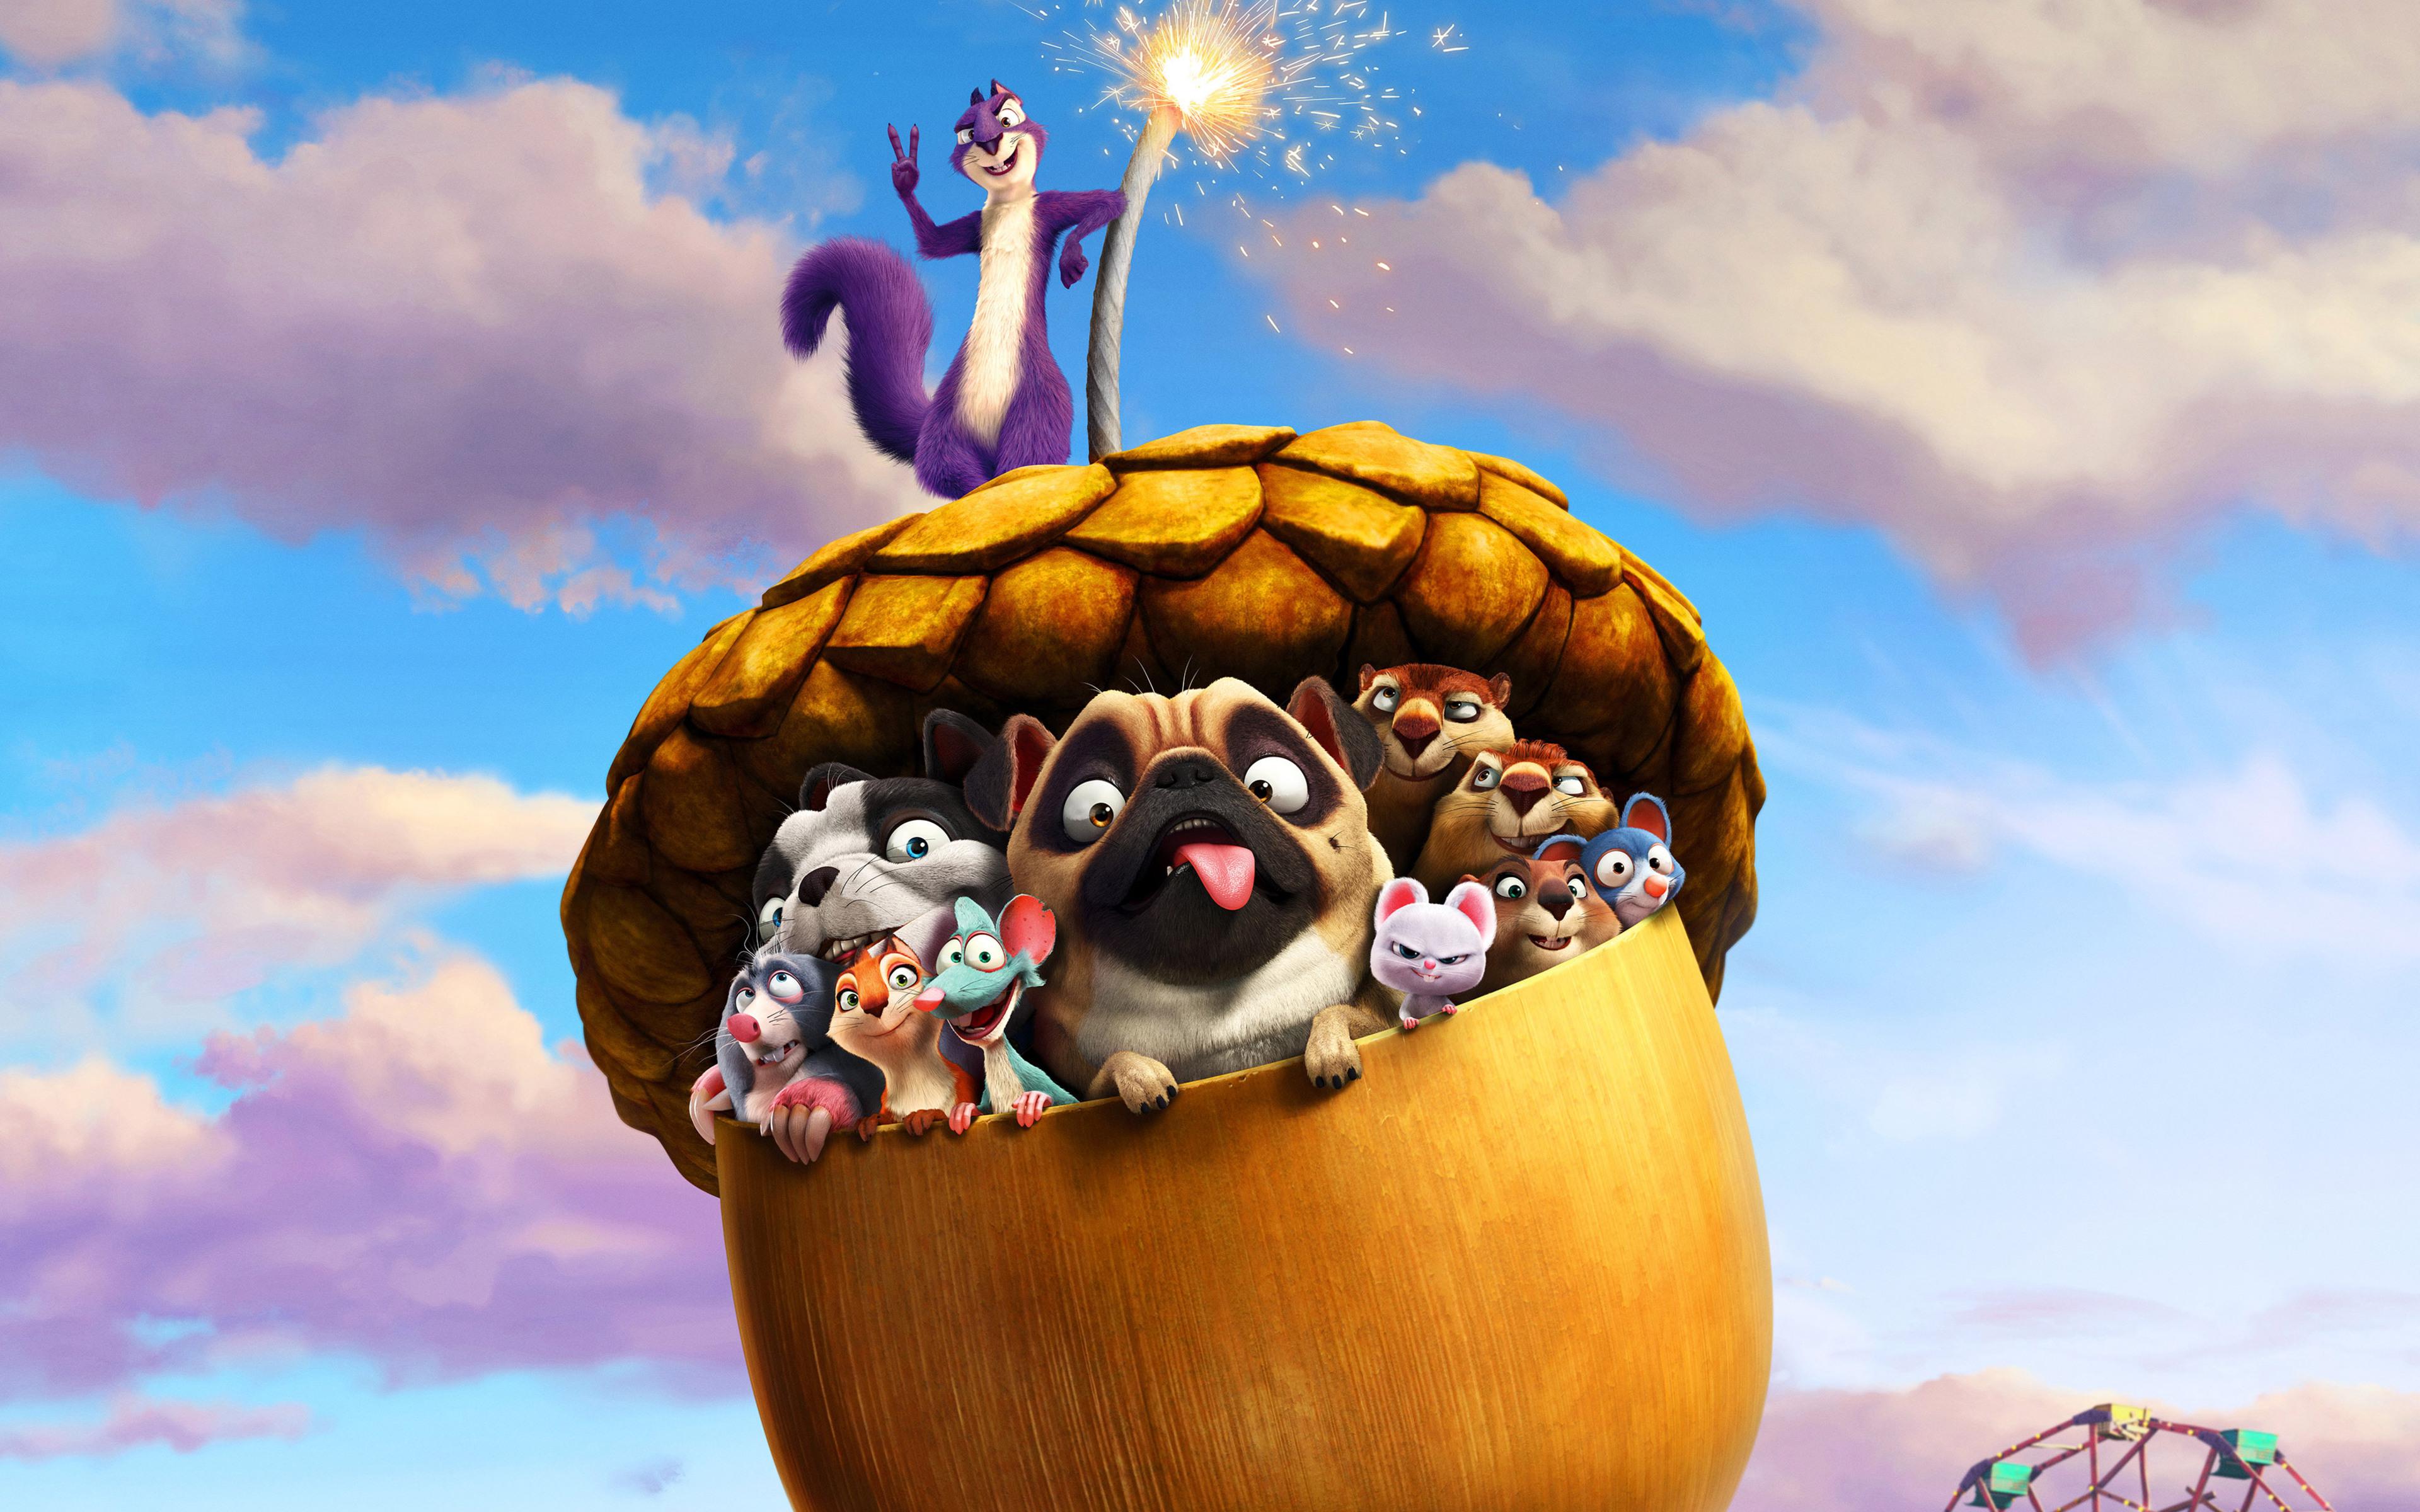 The Nut Job Movie Wallpaper 3840x2400 The Nut Job ...